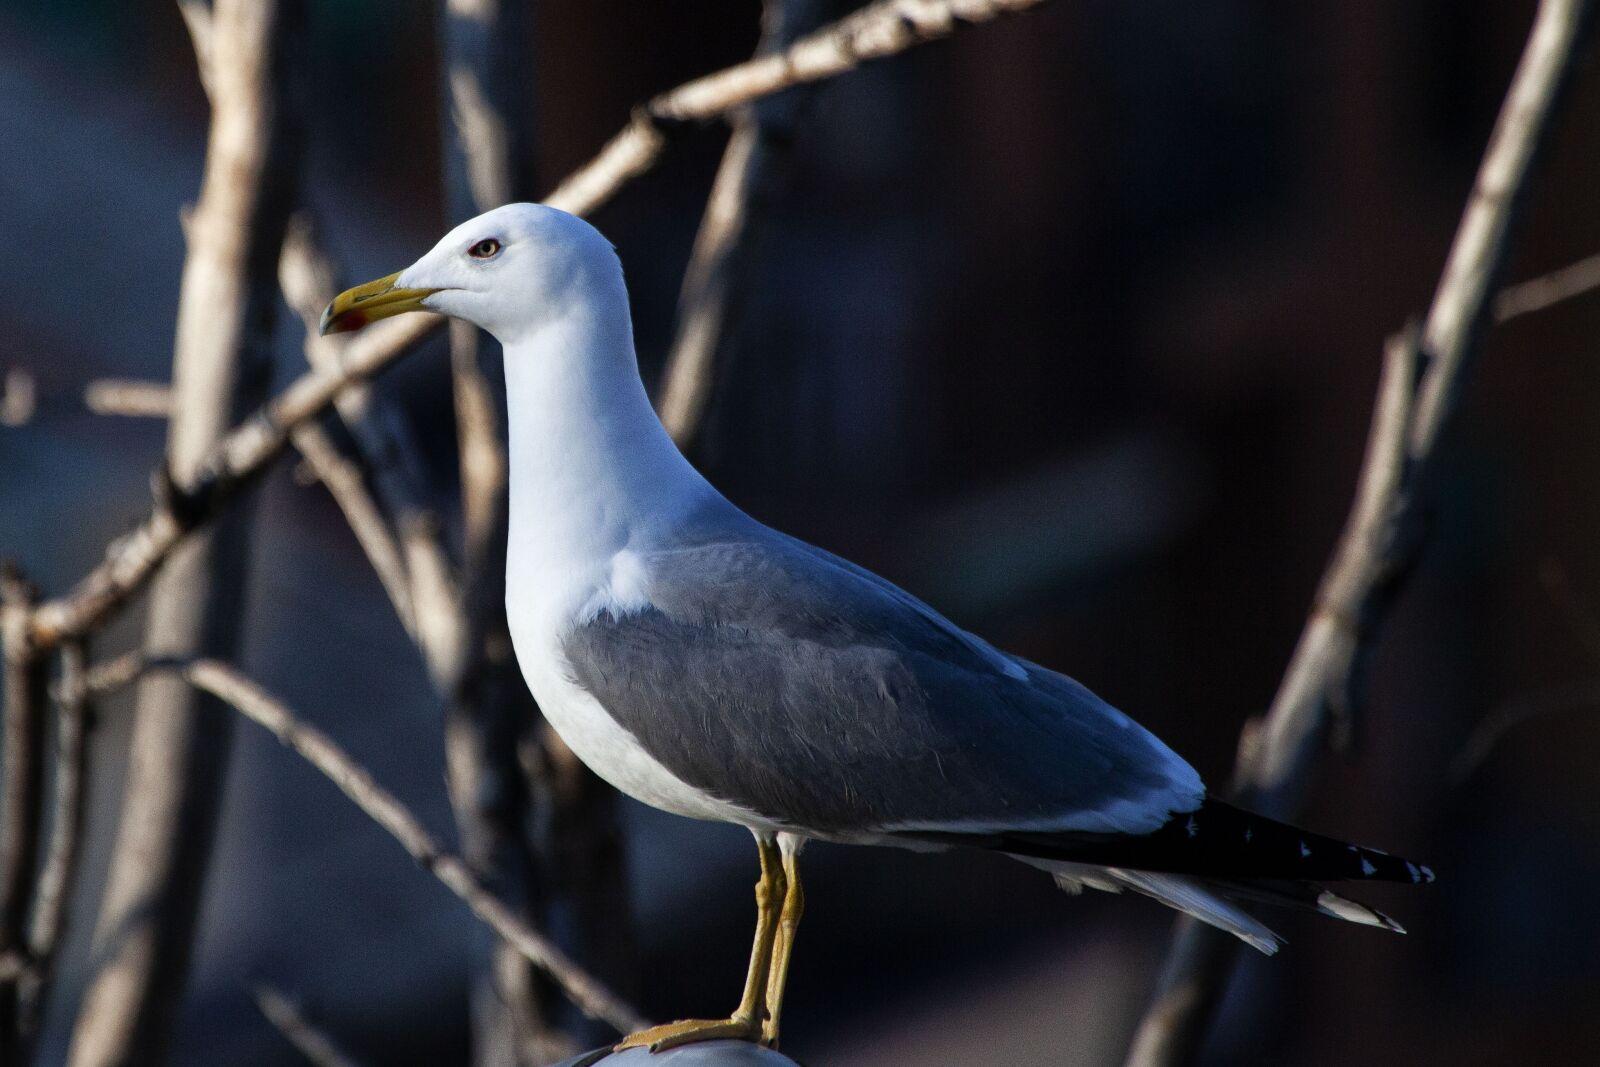 seagull, nature, animal